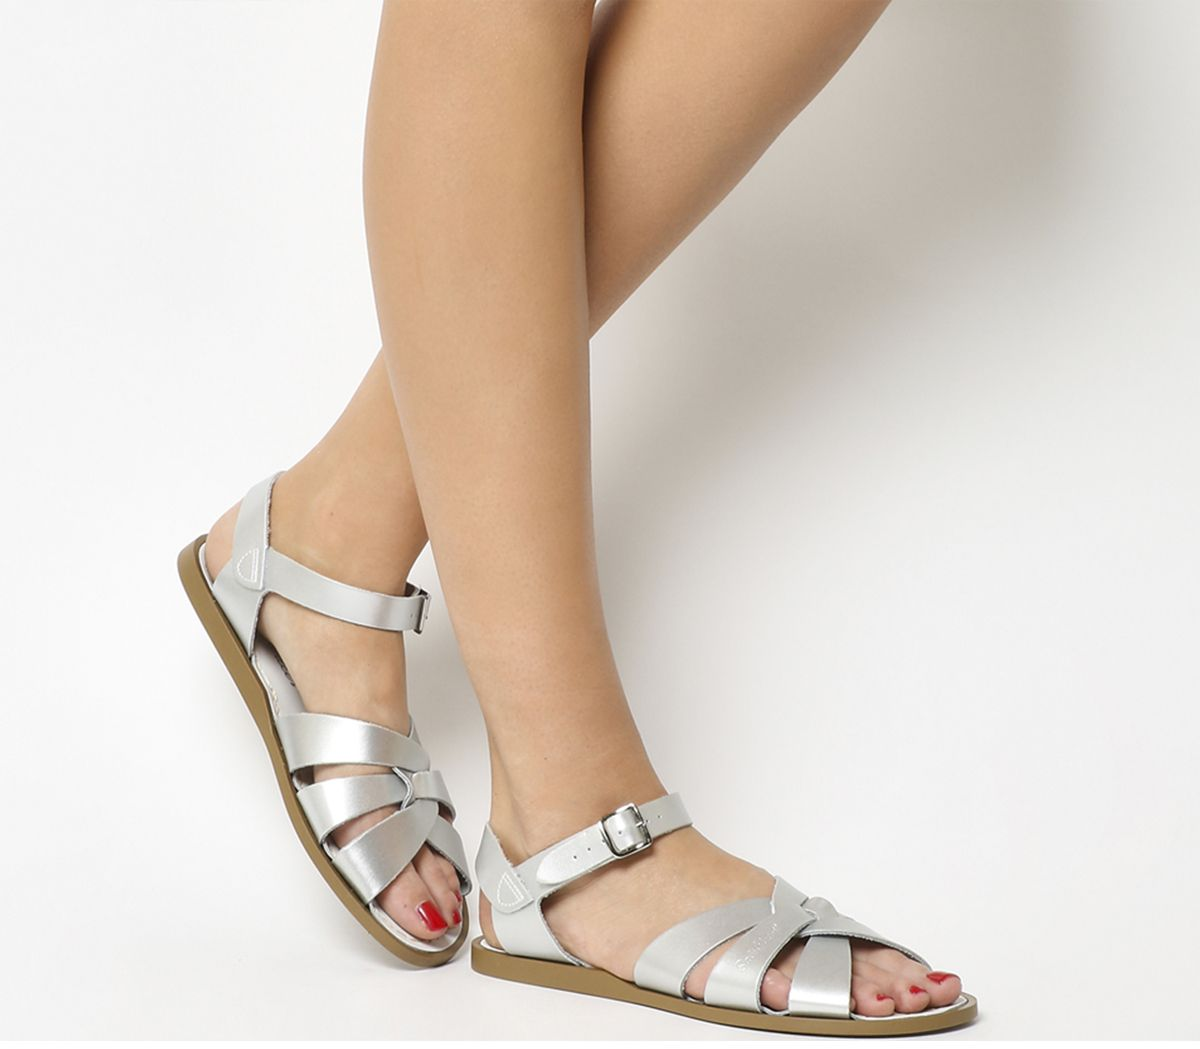 29e2f9fc6 Salt Water Original Sandals Silver Leather - Sandals